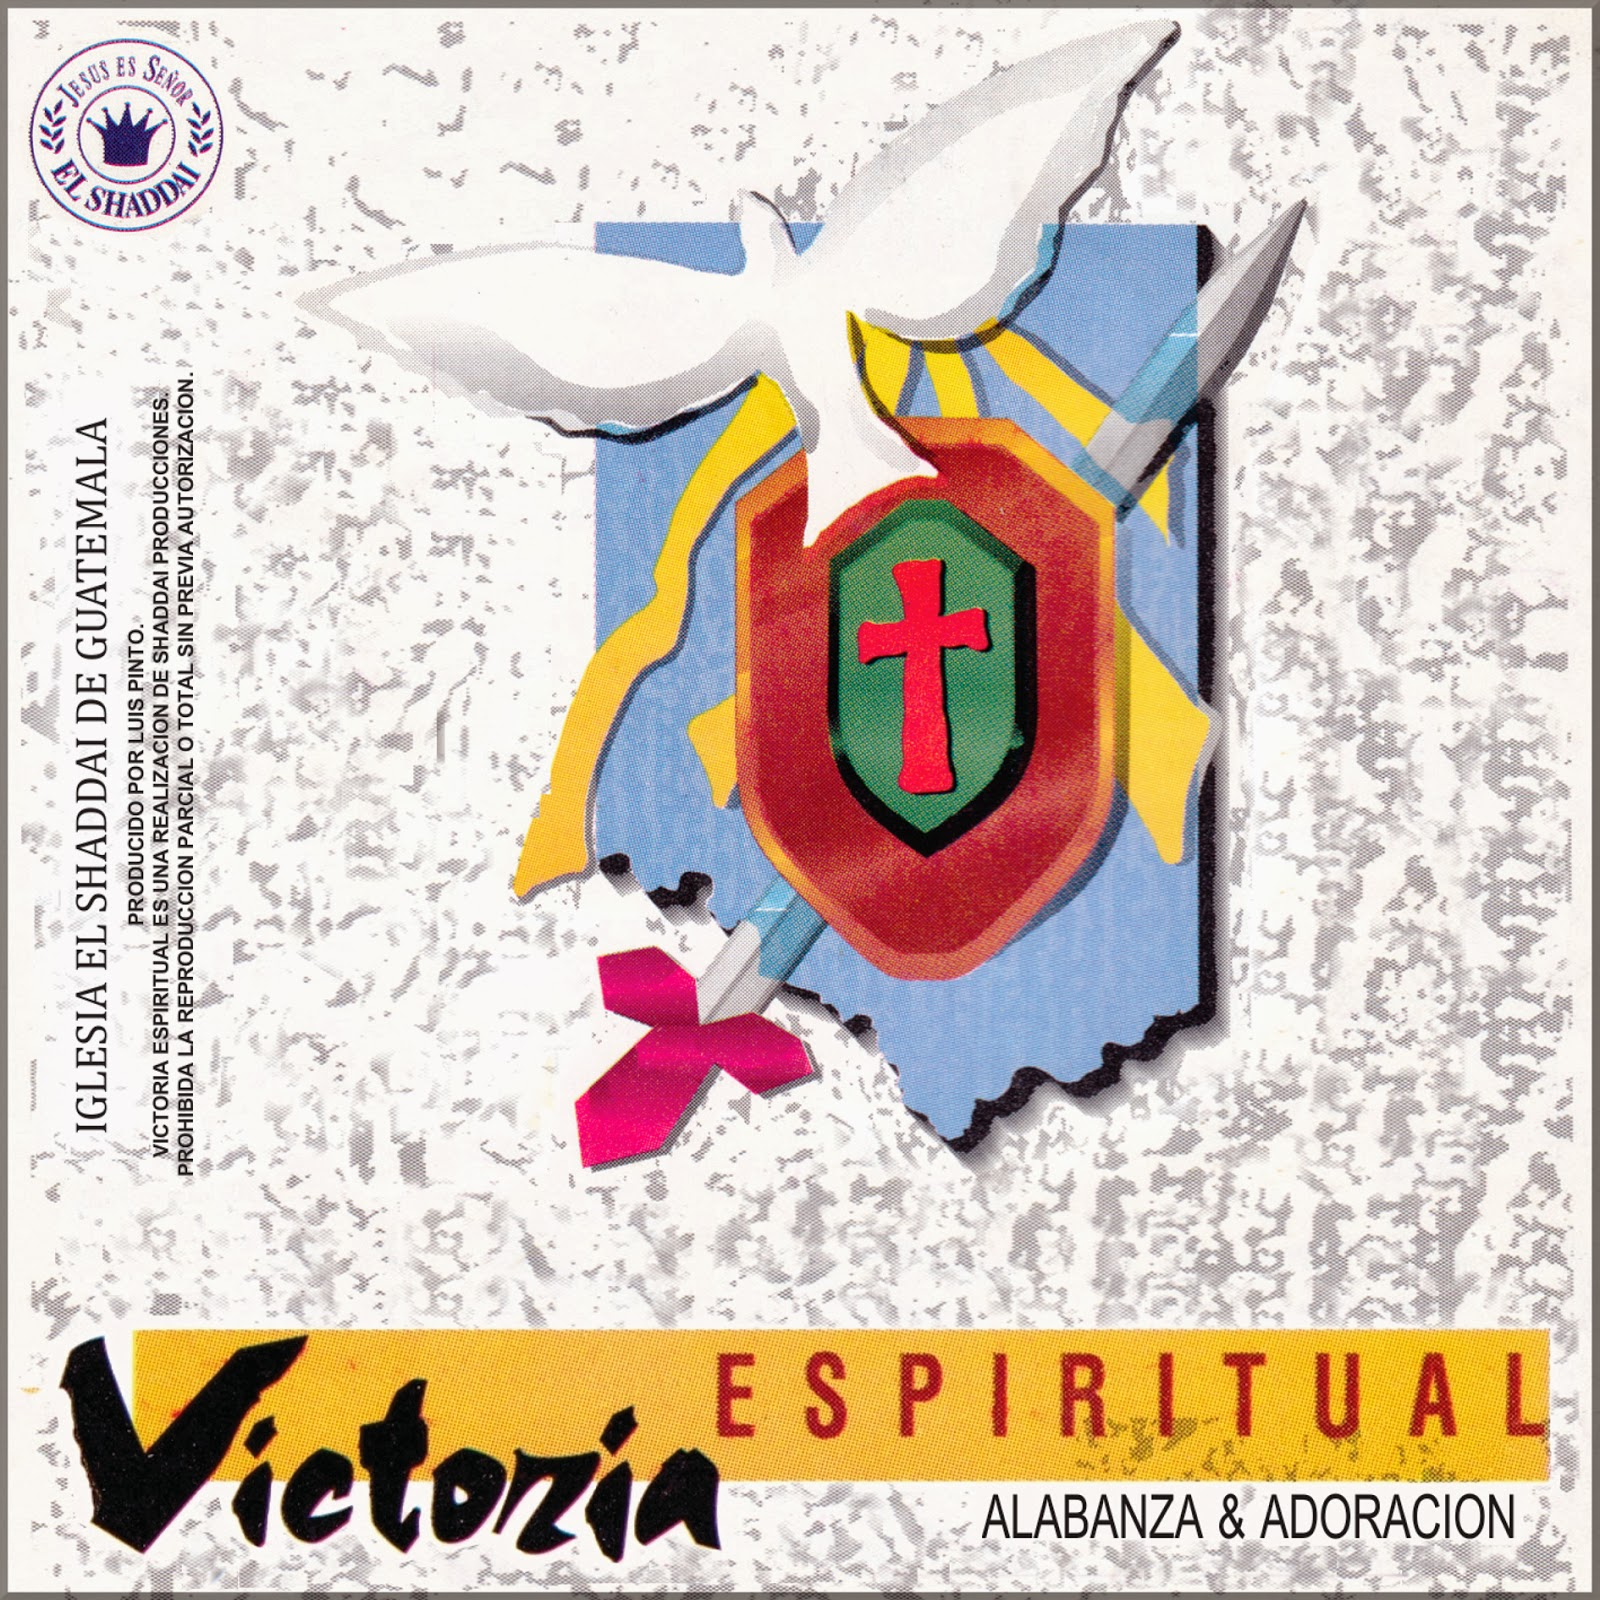 Iglesia El Shaddai Guatemala-Victoria Espiritual-